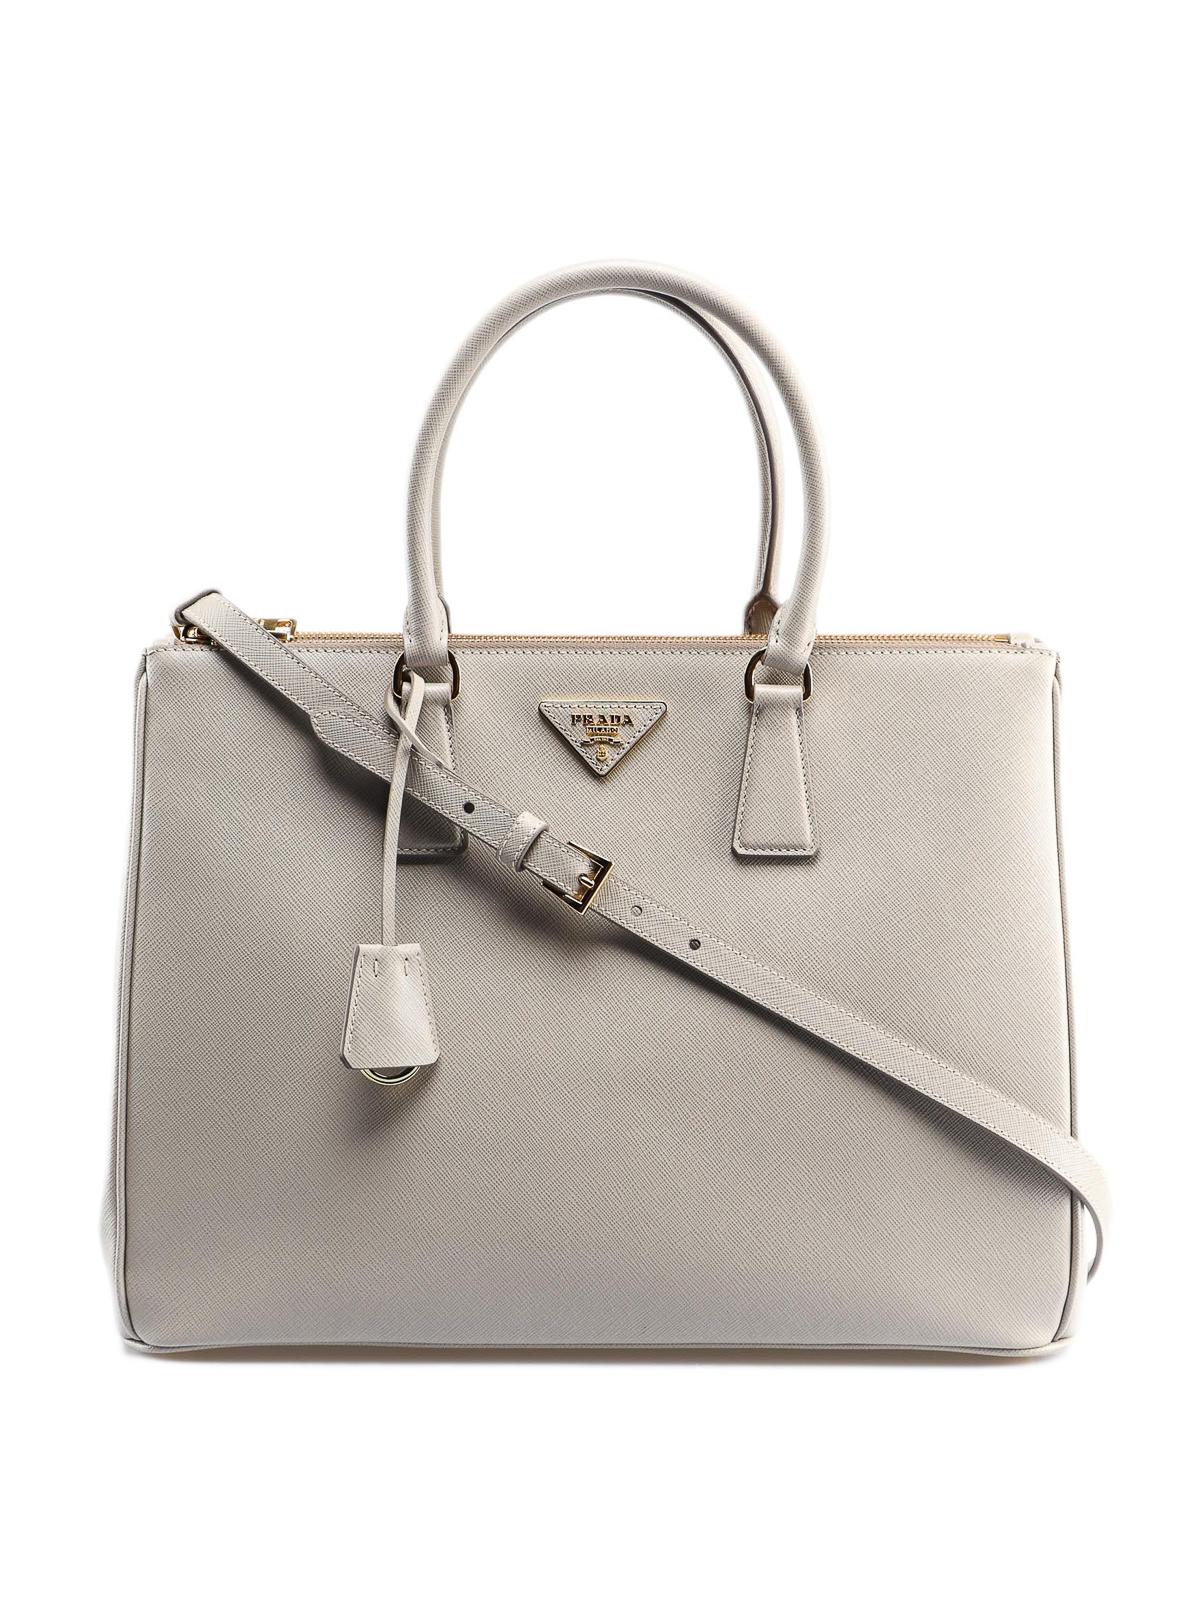 3bbdde271bbc Prada - Galleria grey saffiano leather tote bag - totes bags ...